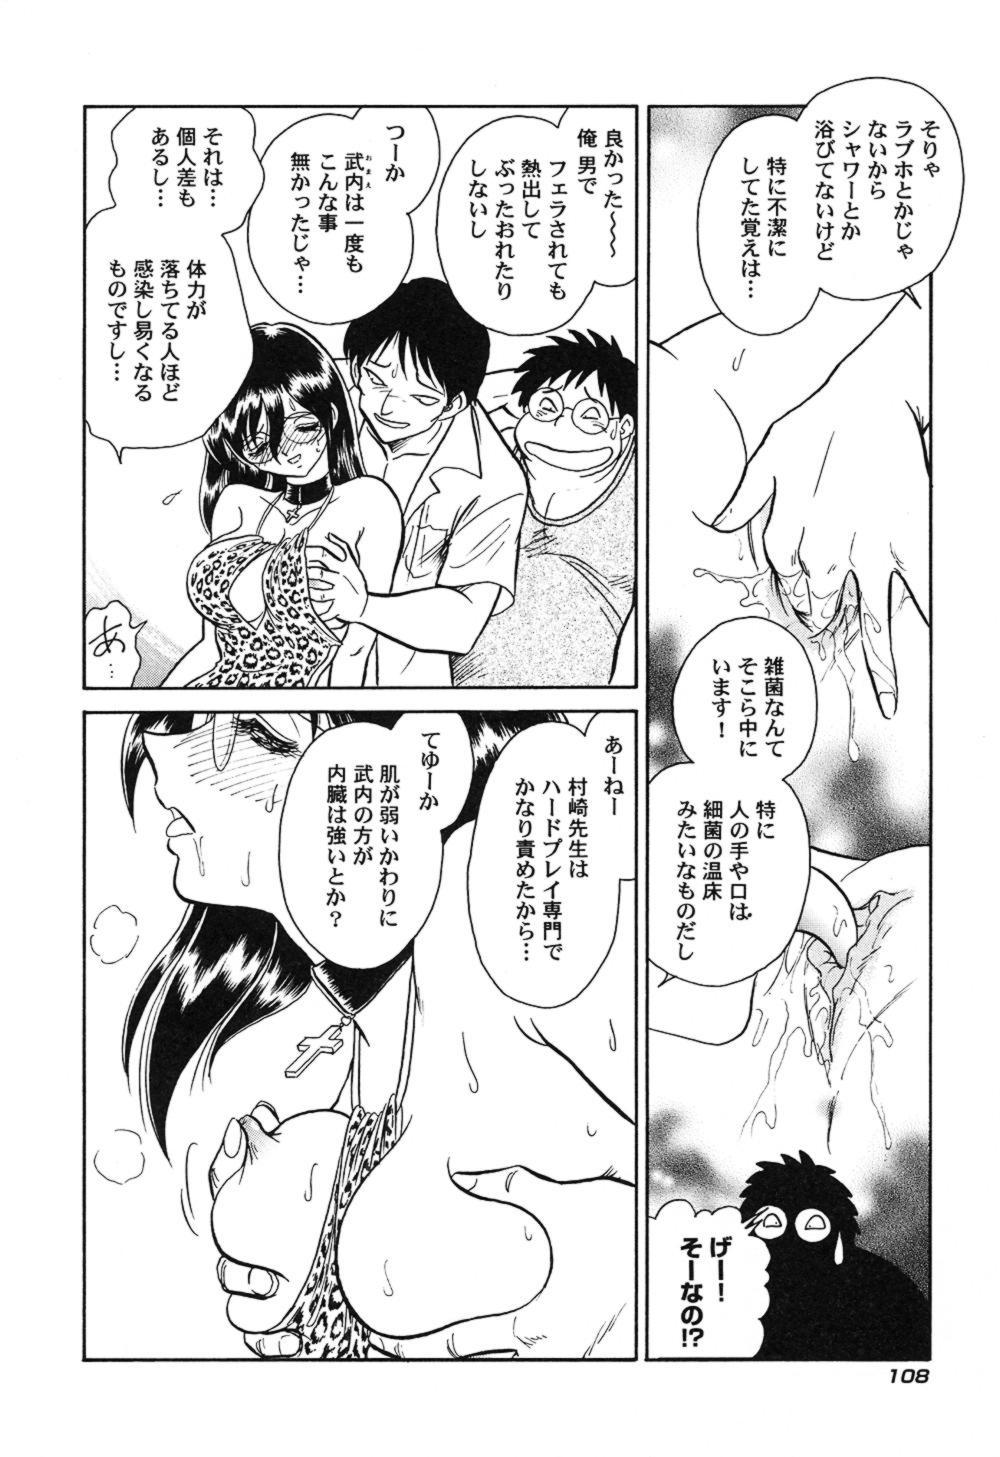 Hageshii Kagai Jugyou 110